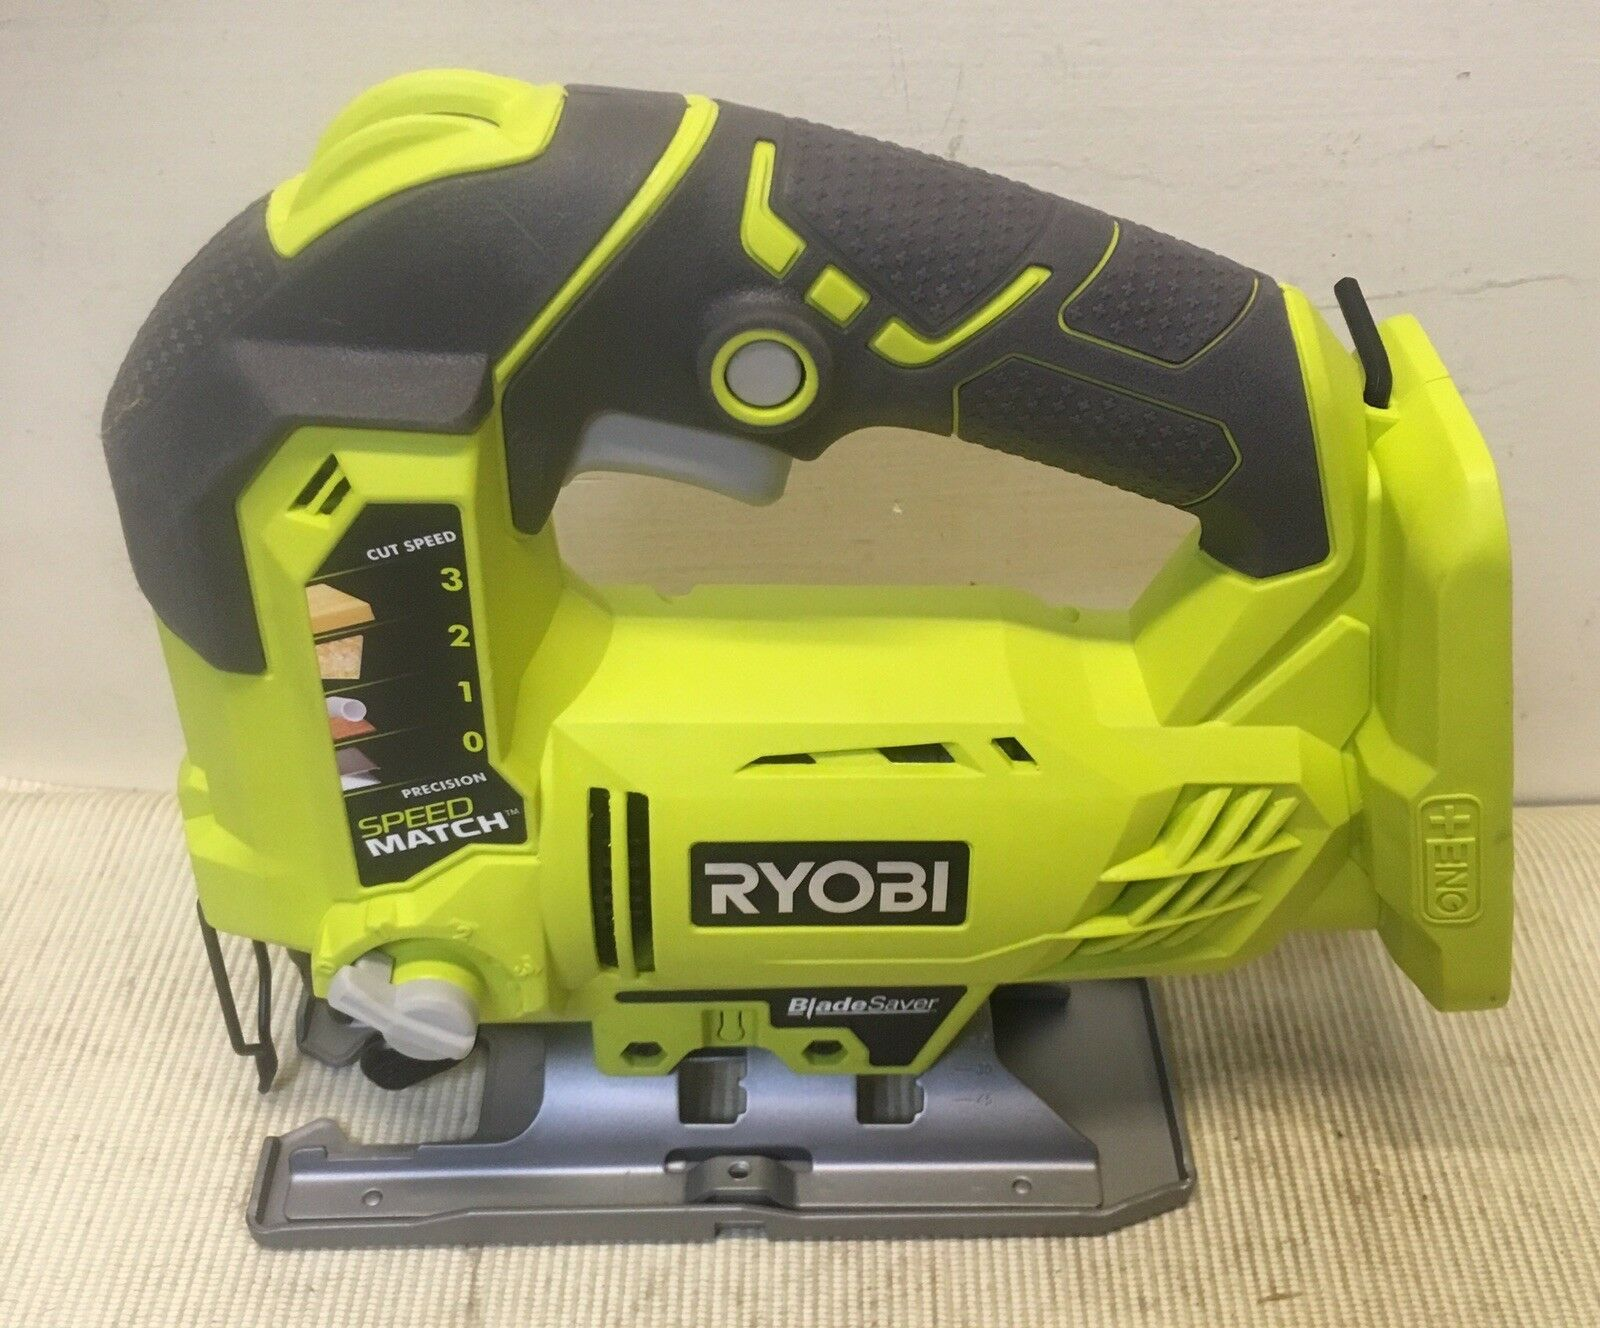 Ryobi Cordless P5231 18-Volt ONE+ Orbital Jig Saw (Includes Wood Blade & Manual)